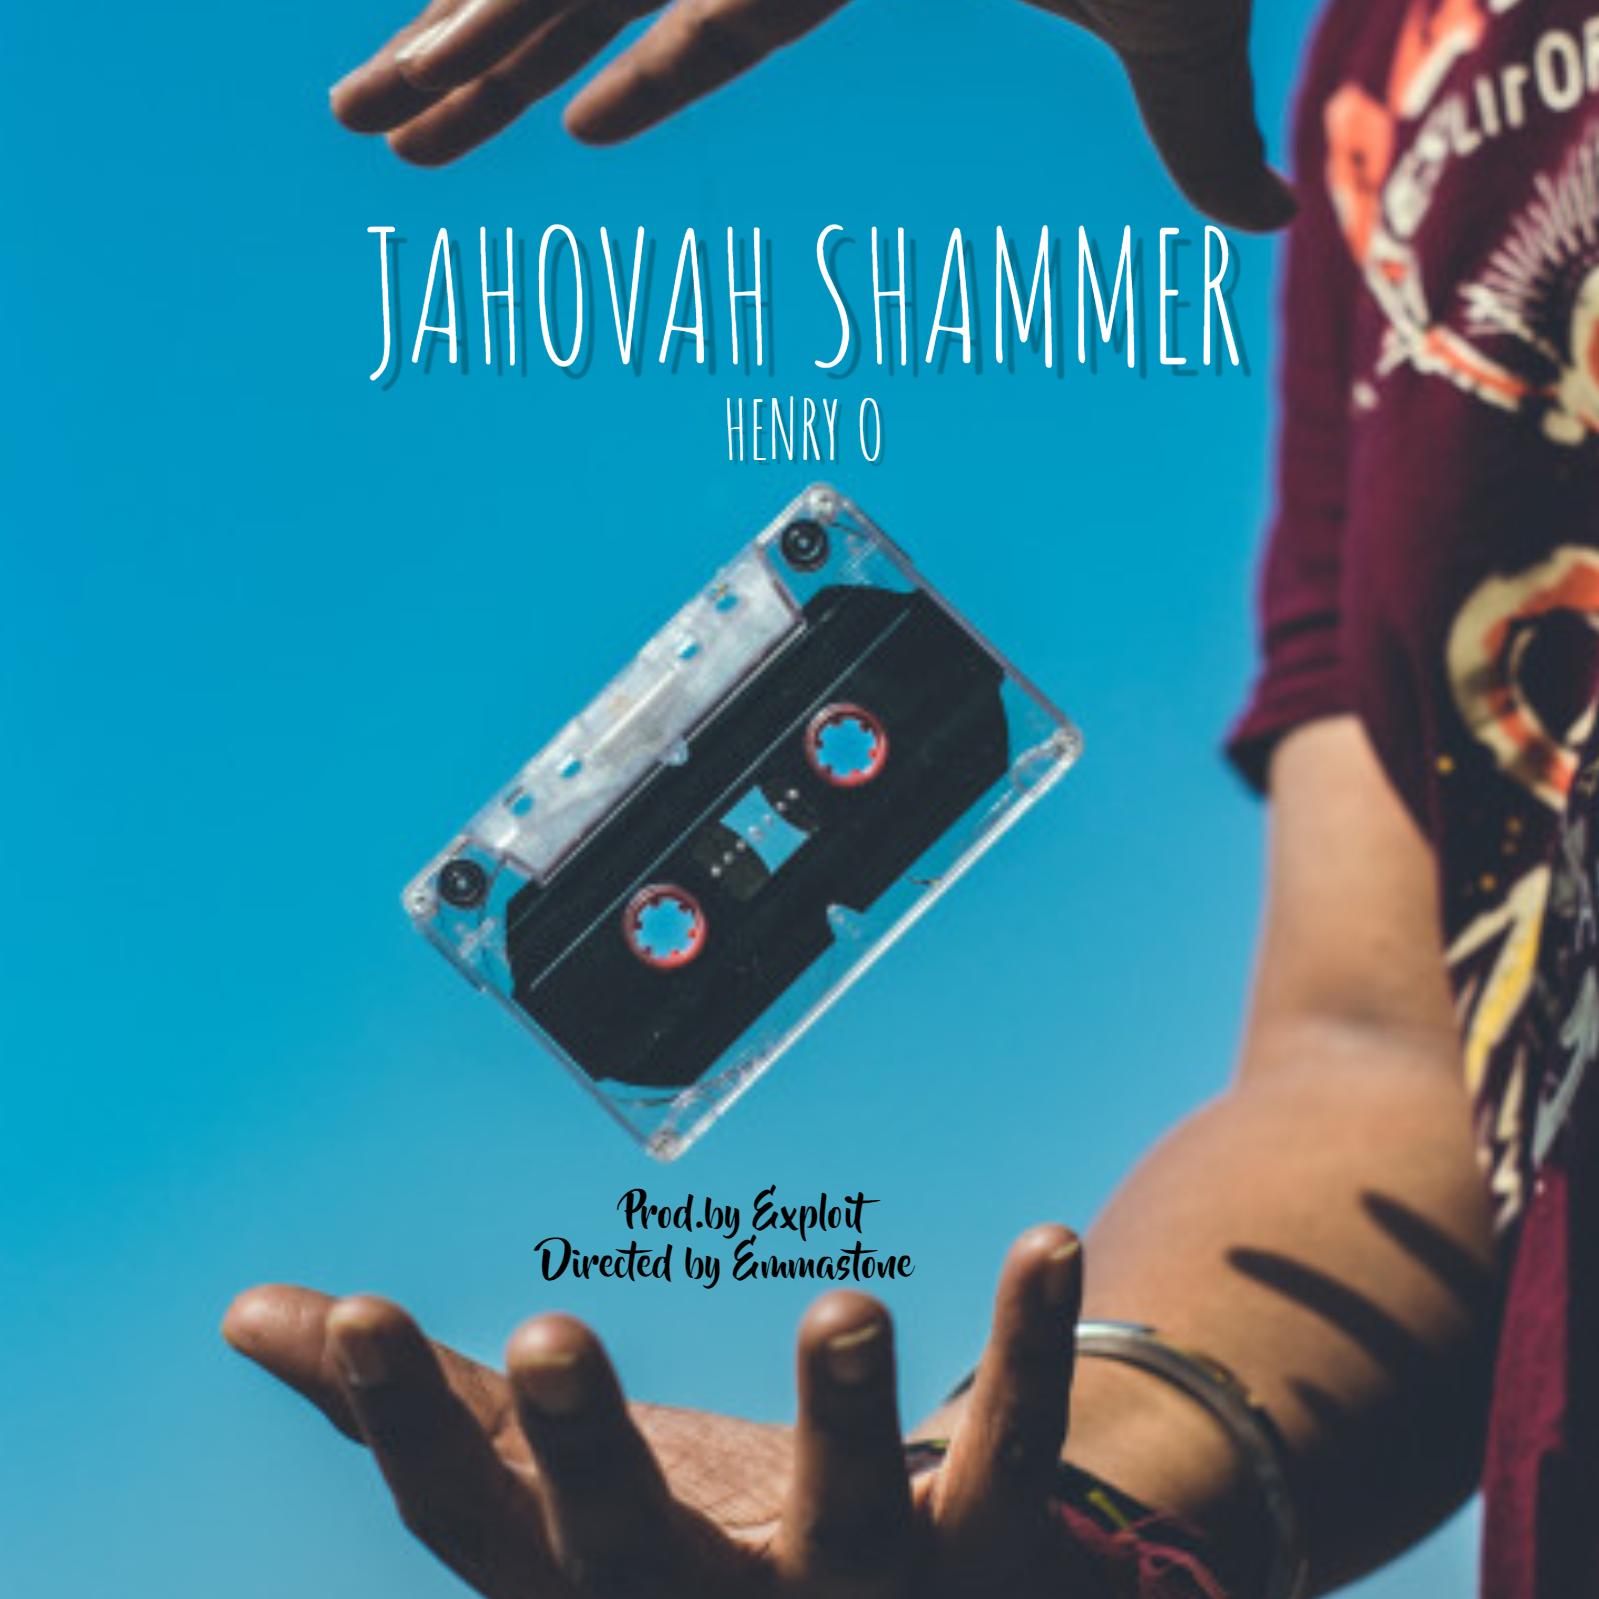 Henry O - Jehovah Shammer